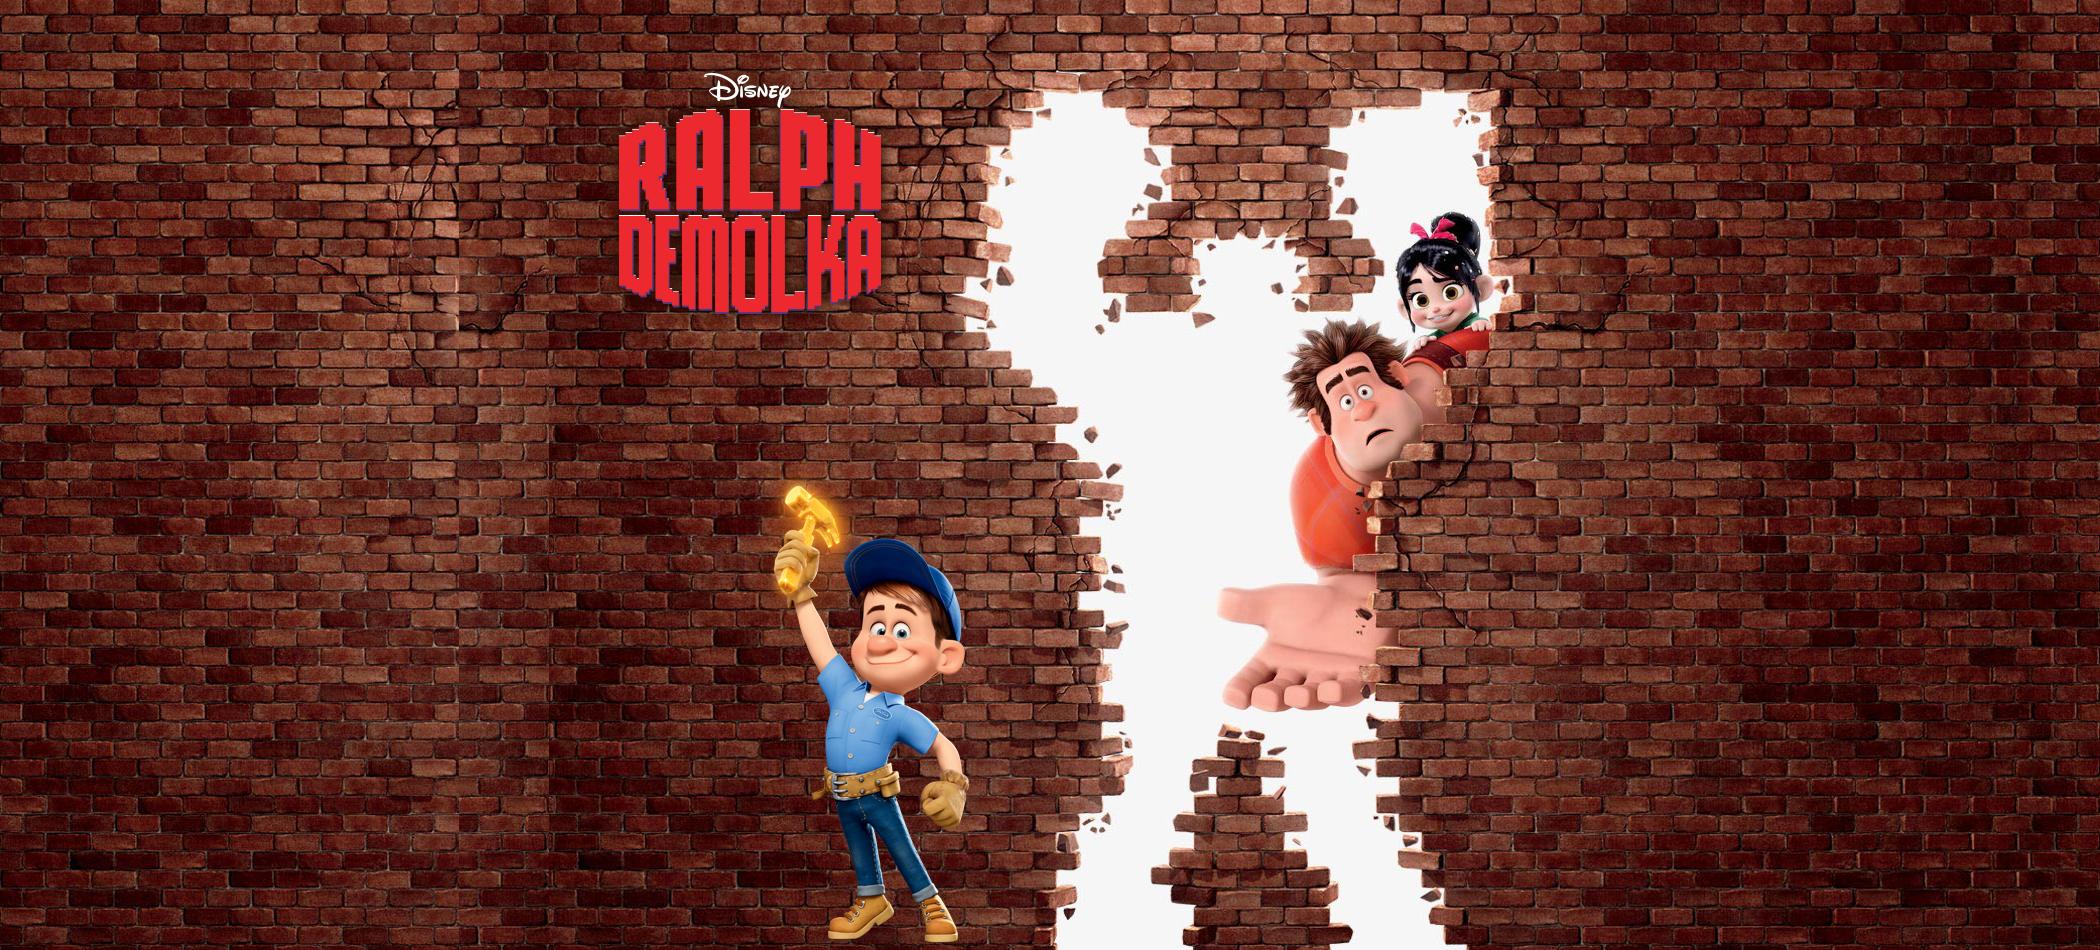 Ralph Demolka – Recencja